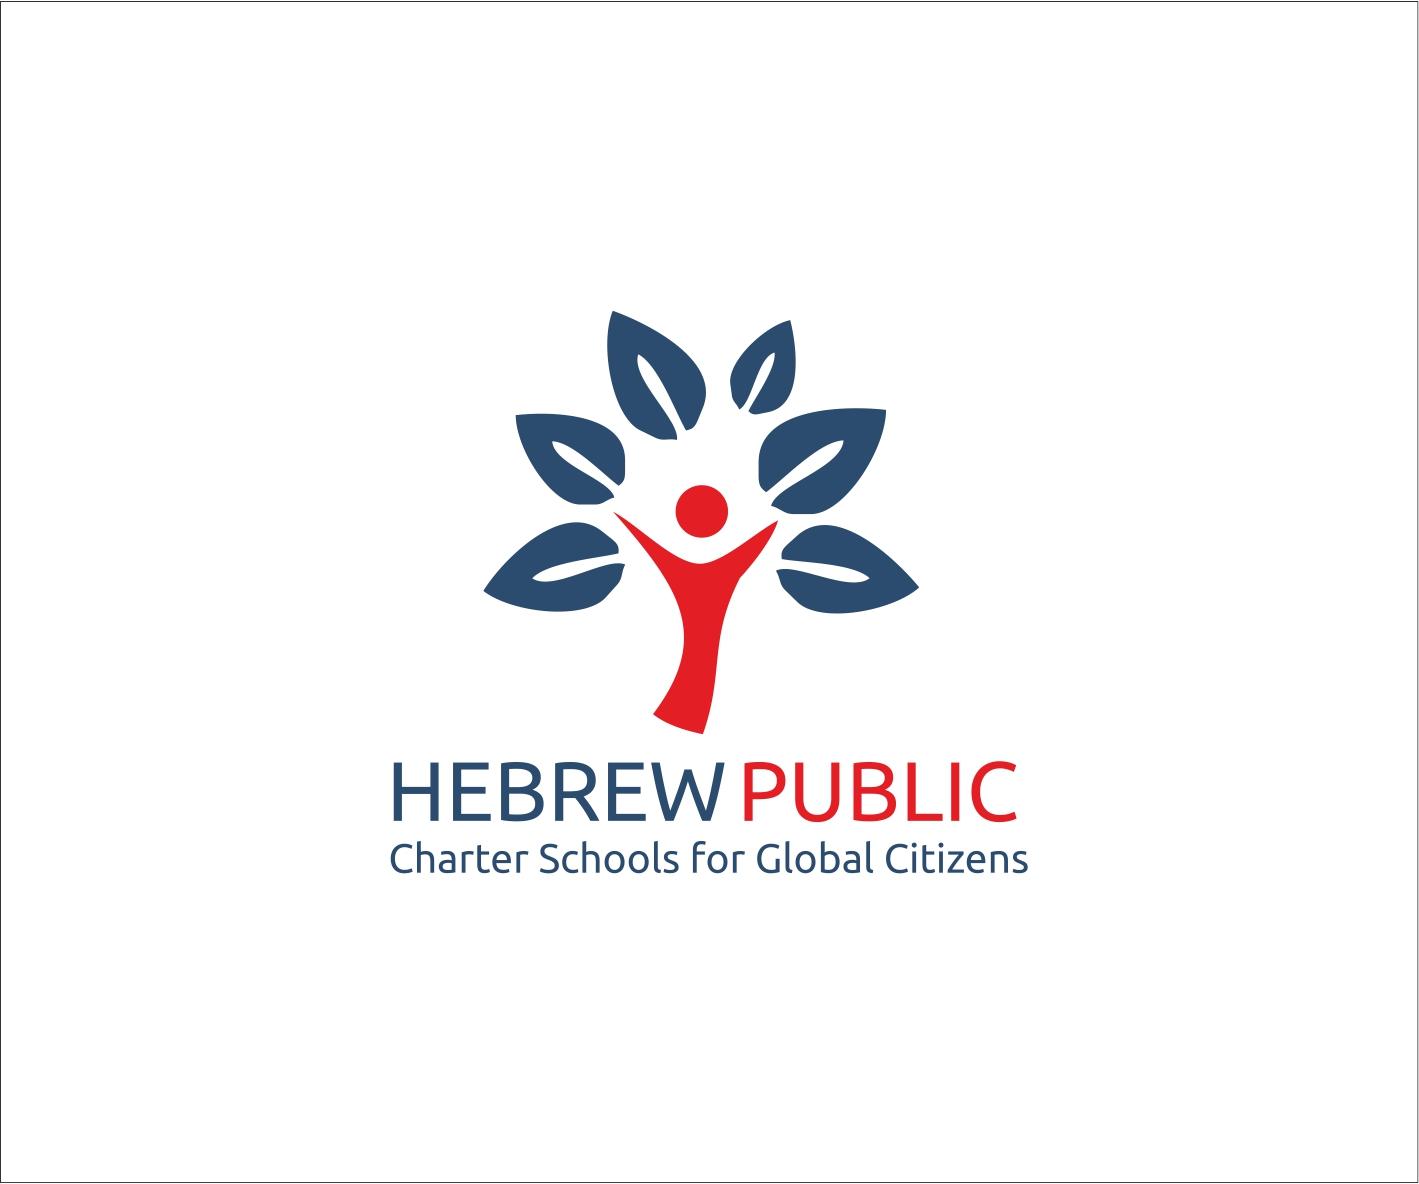 School Logo Design For Hebrew Public (tag: Charter Schools